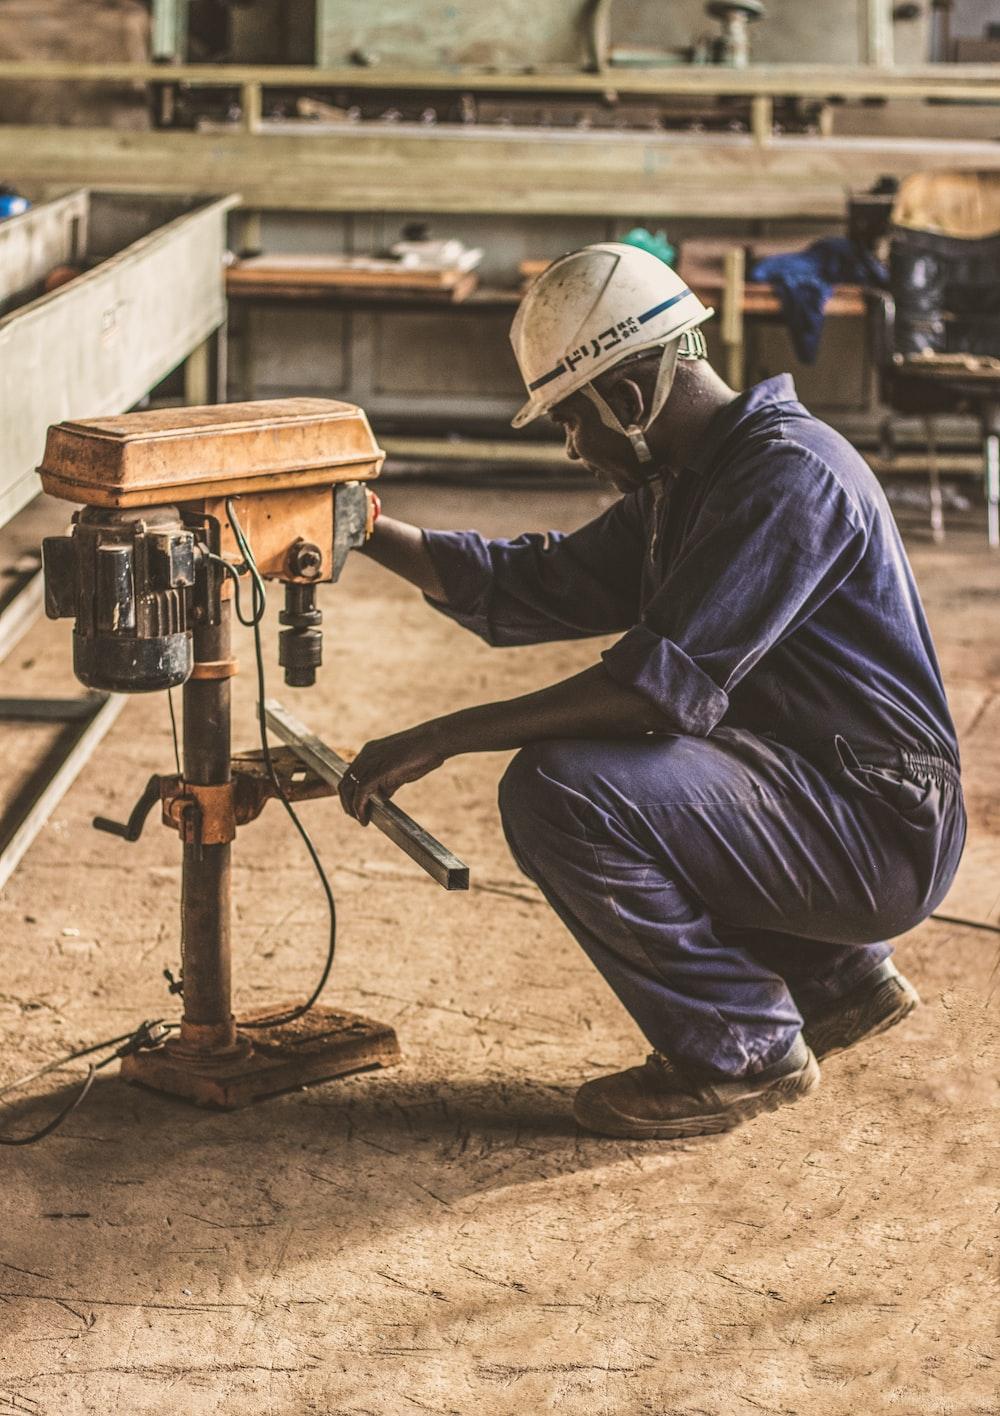 man wearing white hard hat operating brown drill press